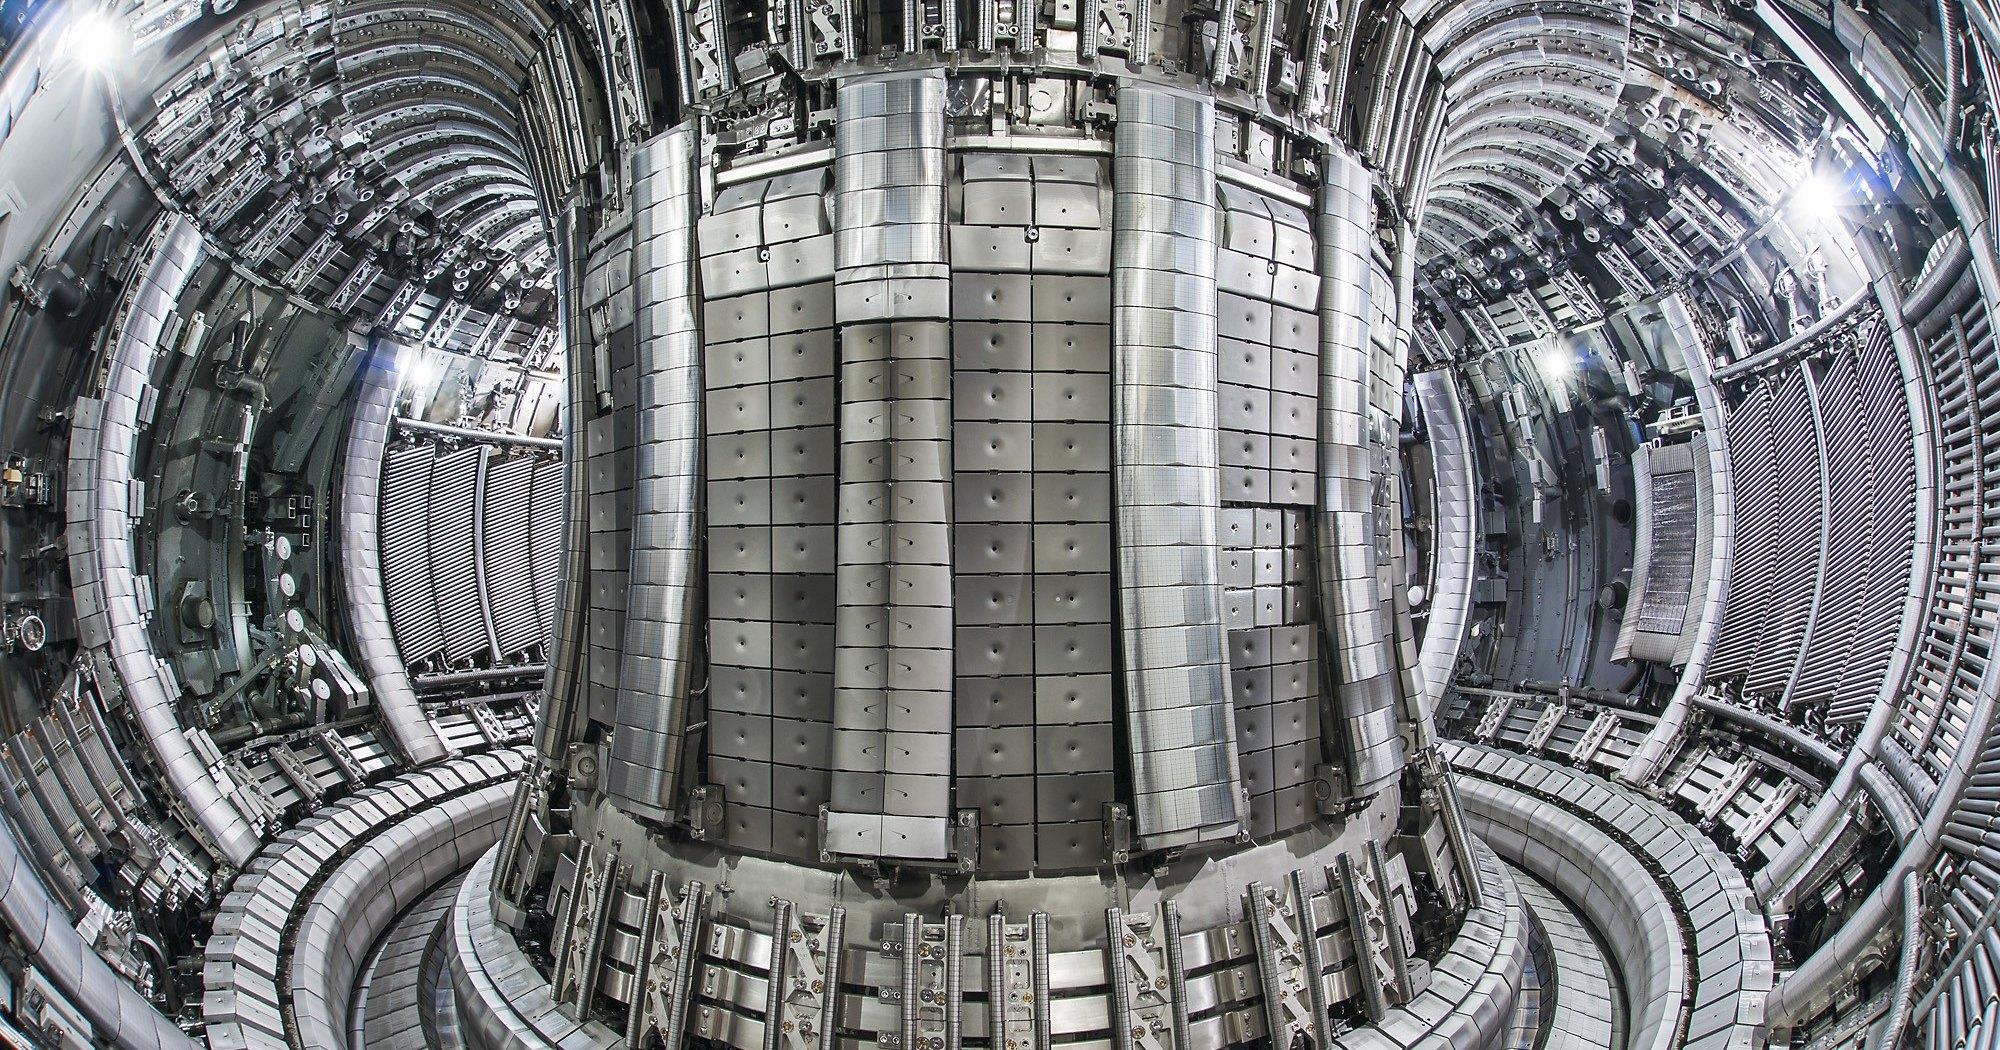 КПД термоядерных реакторов повысят за счёт льда